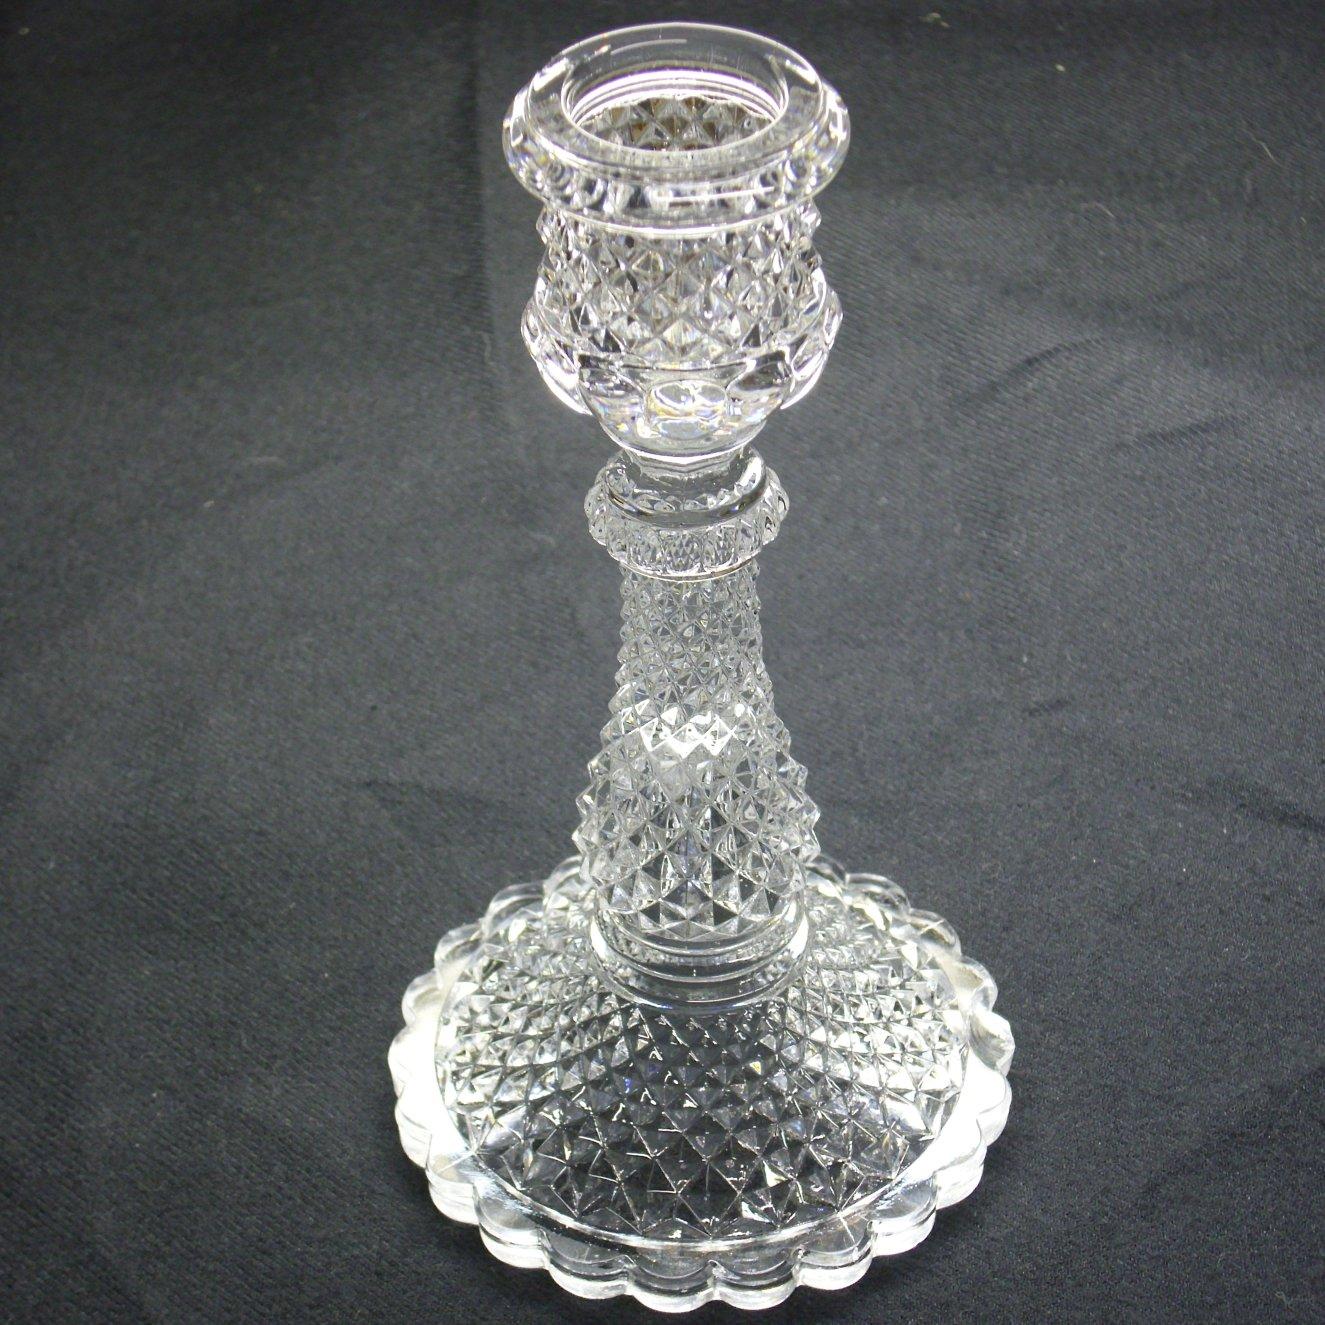 Baccarat glass crystal candlestick , candleholder.